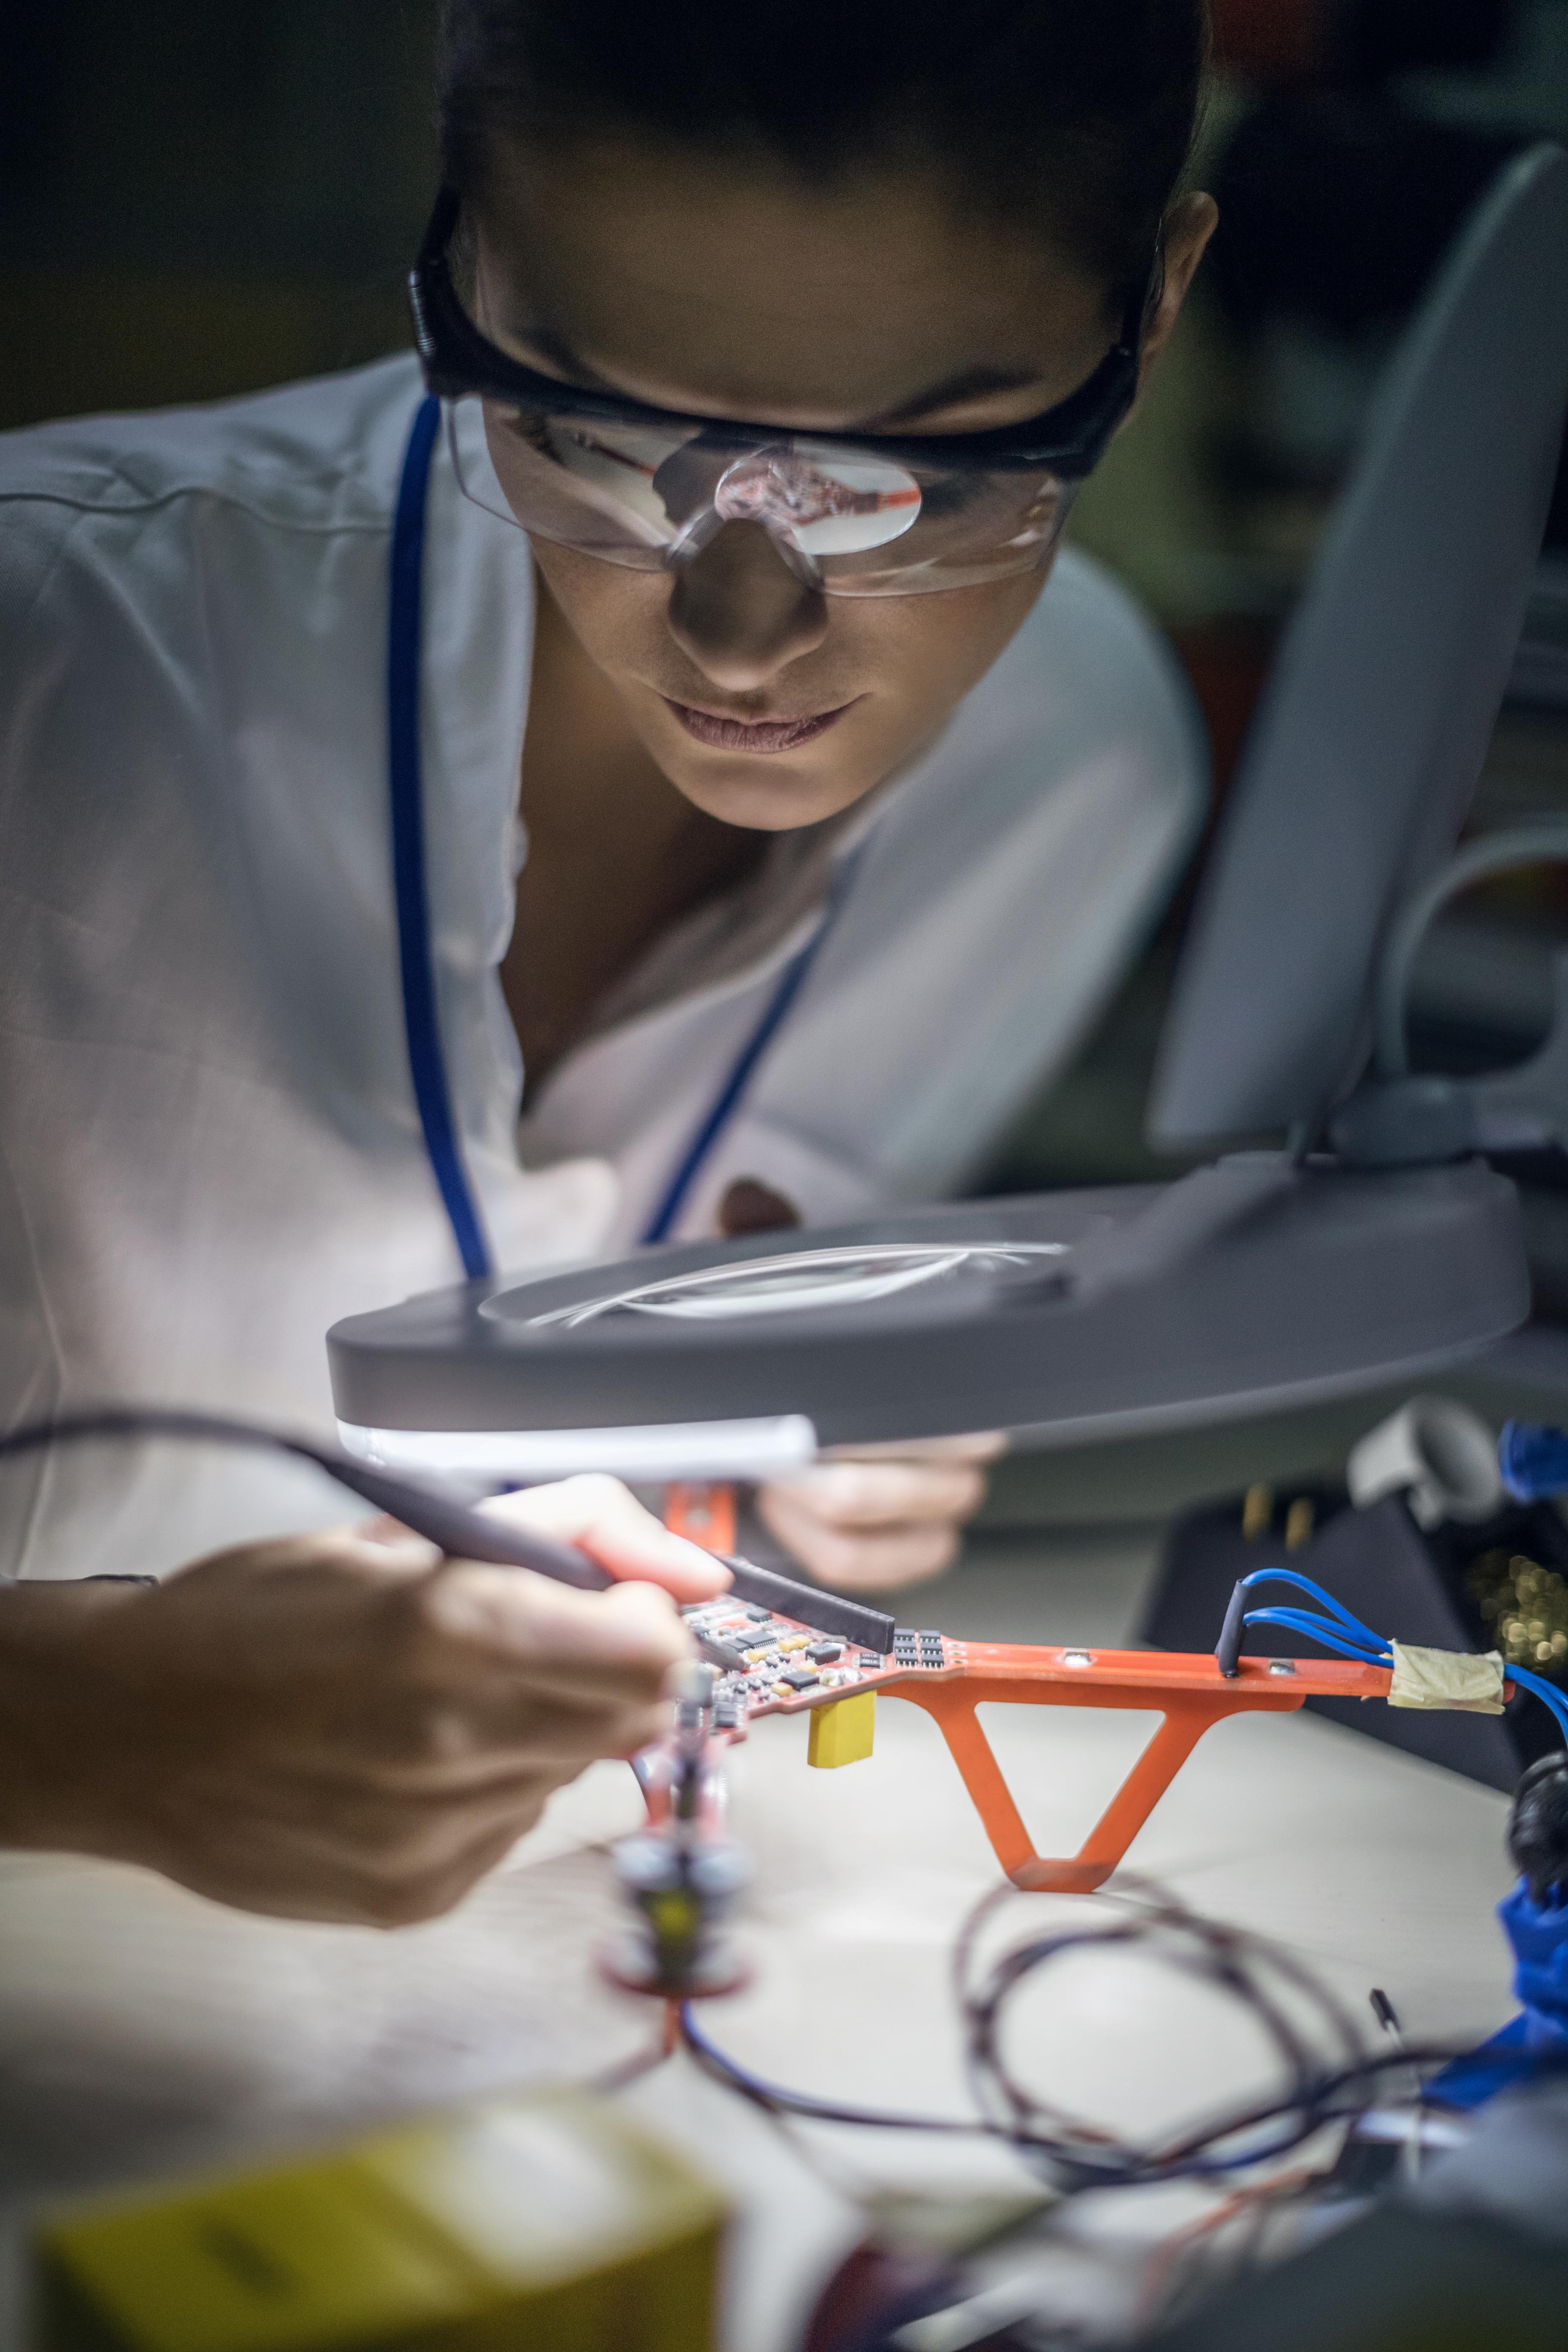 Biomed Service Manuals | Maintenance, Repair, Servicing